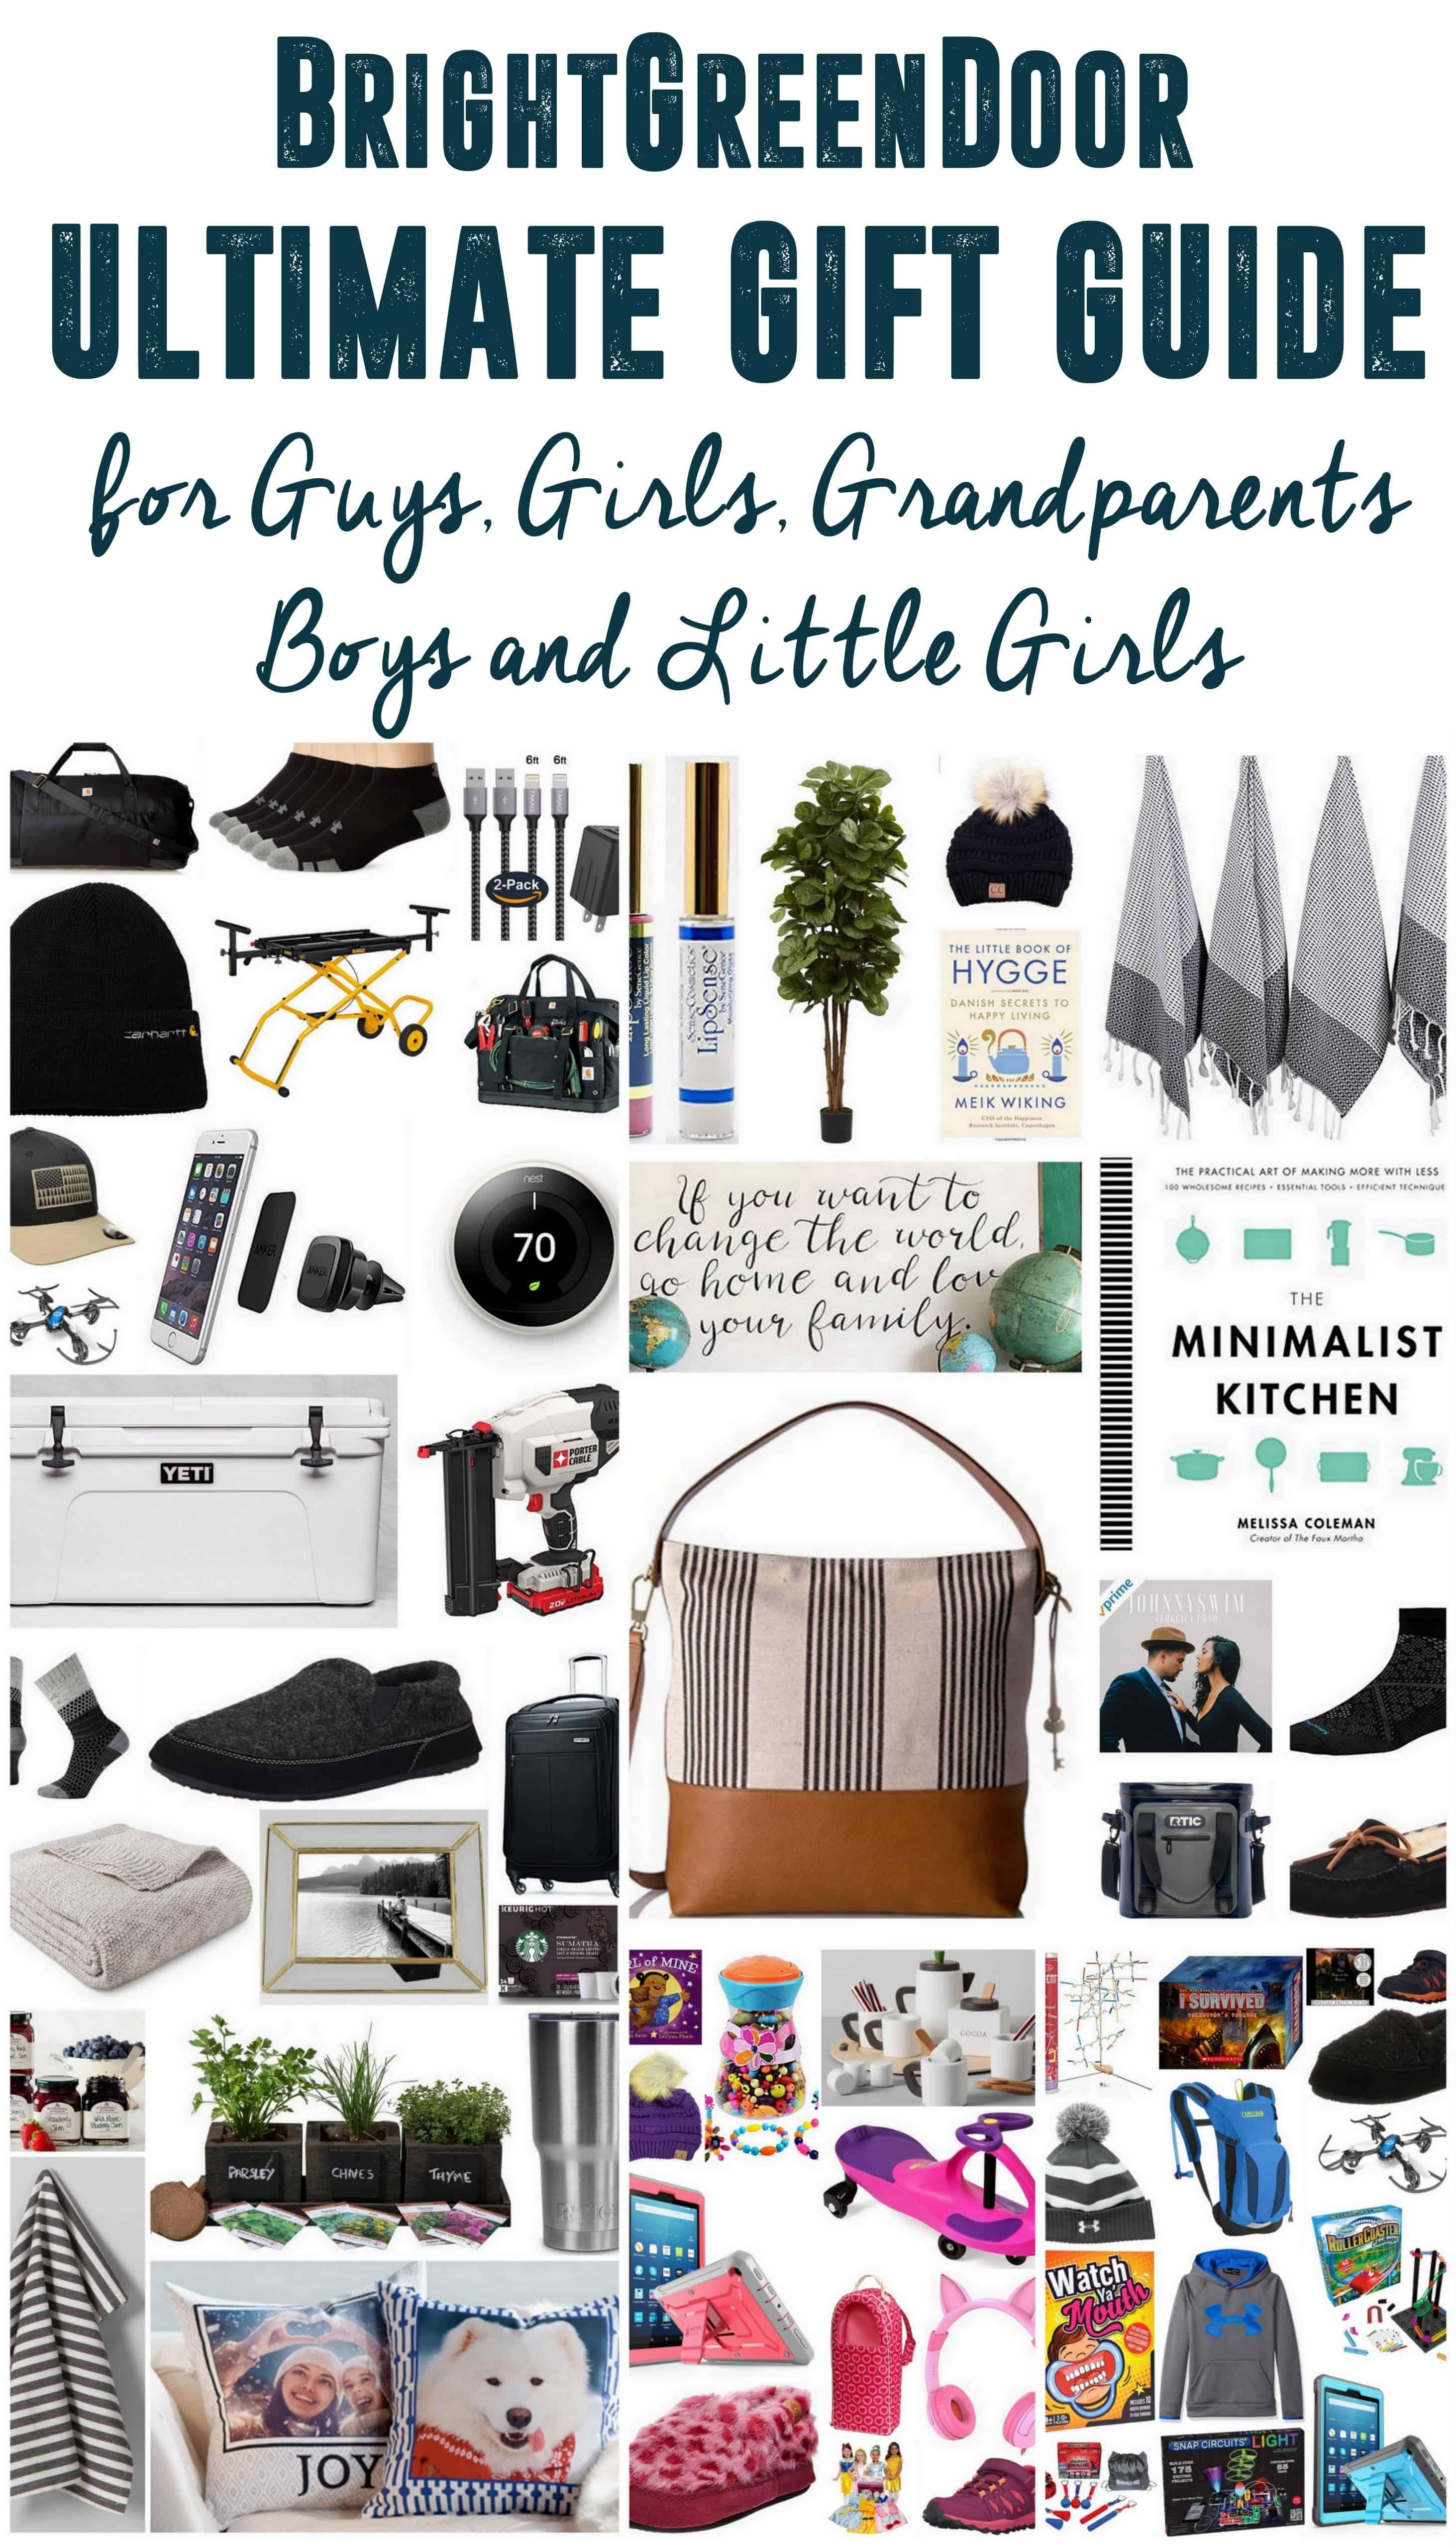 Ultimate Gift Guide Of Christmas Gift Ideas For Girls Guys Little Girls Boys Ultimate Gift Guide Christmas Presents For Men Presents For Men